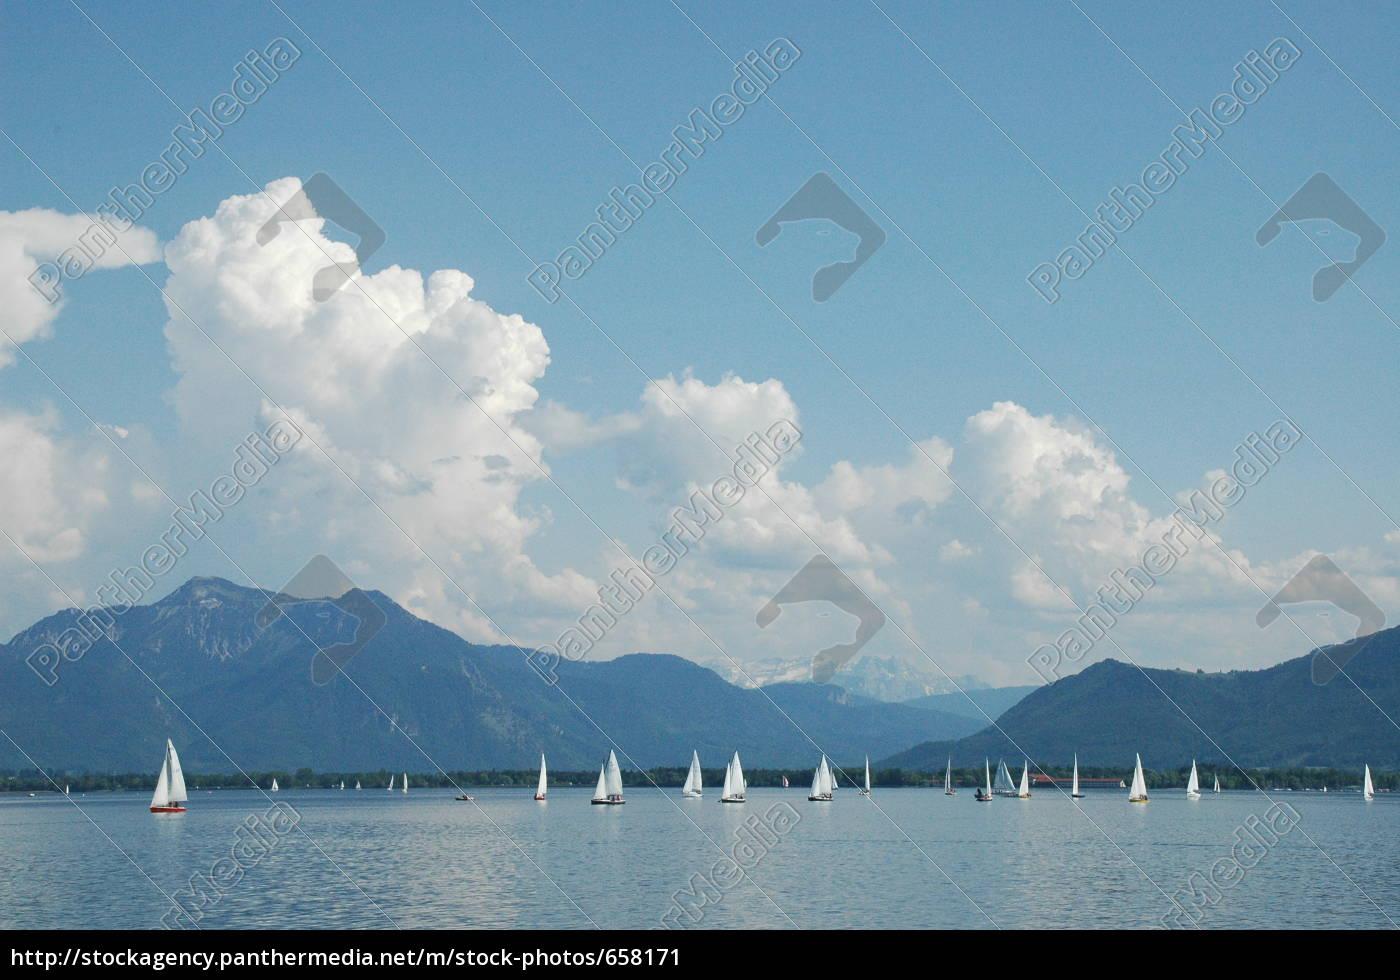 regatta - 658171